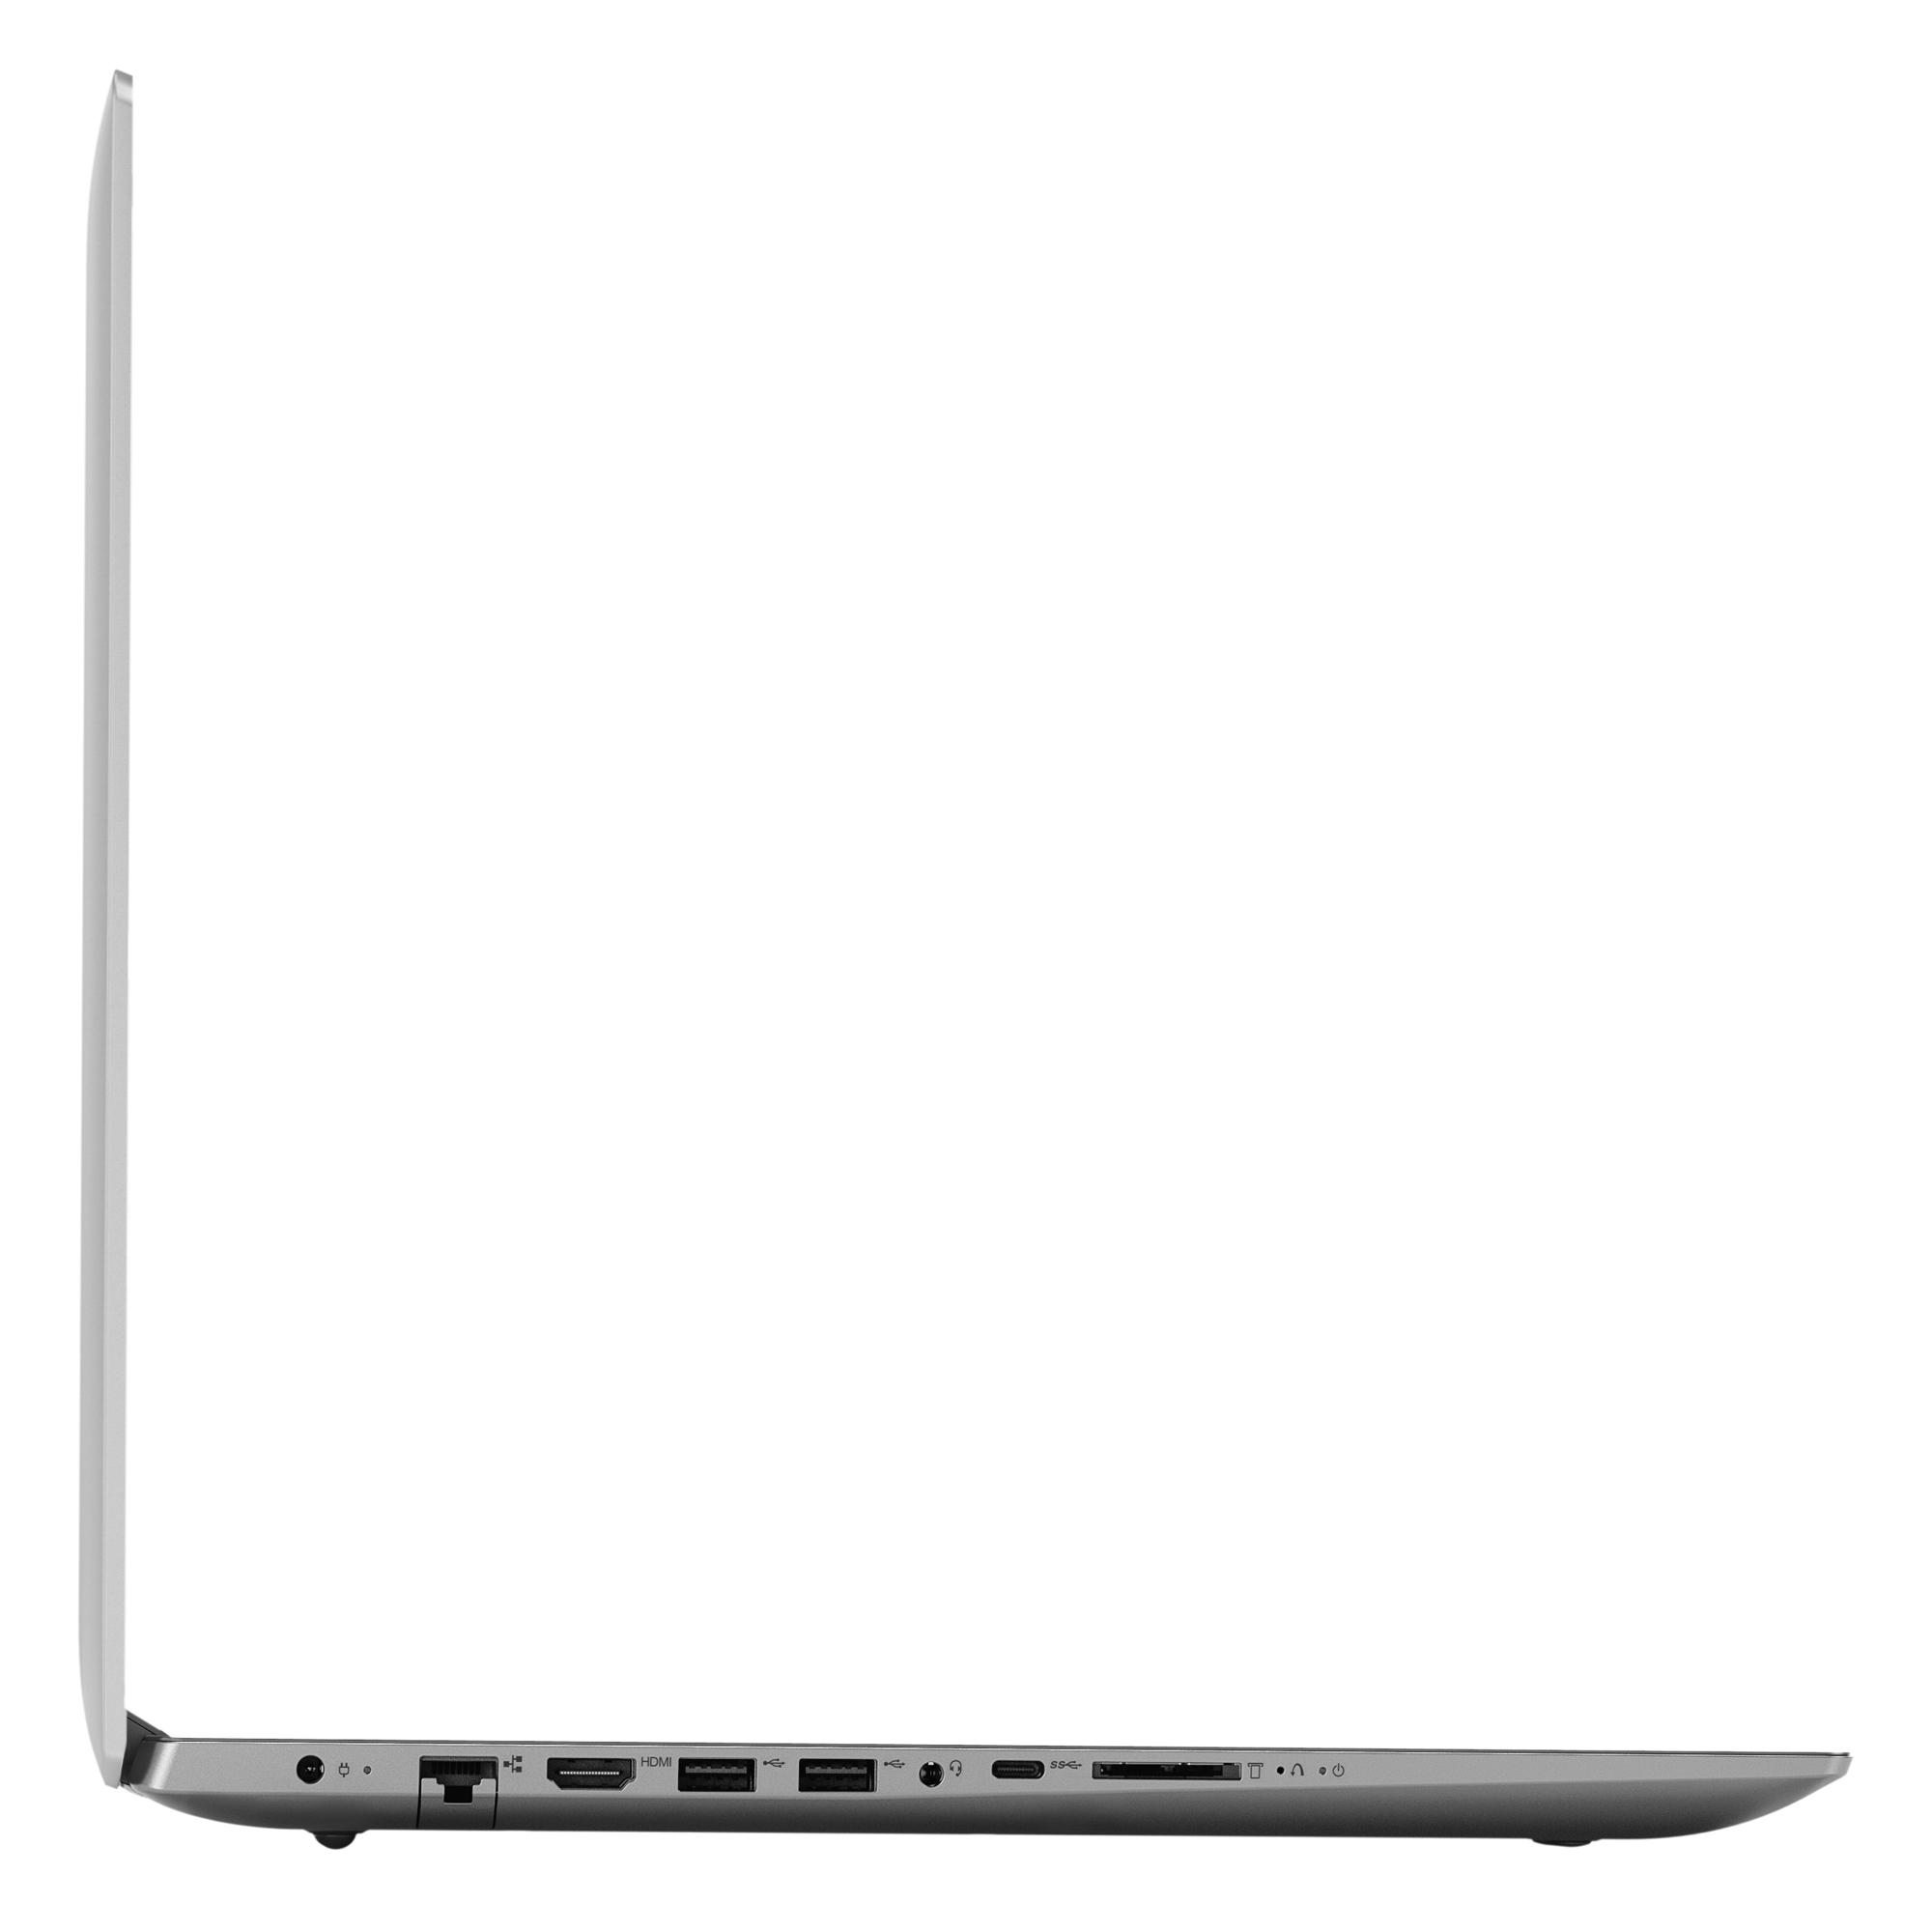 Фото  Ноутбук Lenovo ideapad 330-17IKB Platinum Grey (81DM00CWRU)